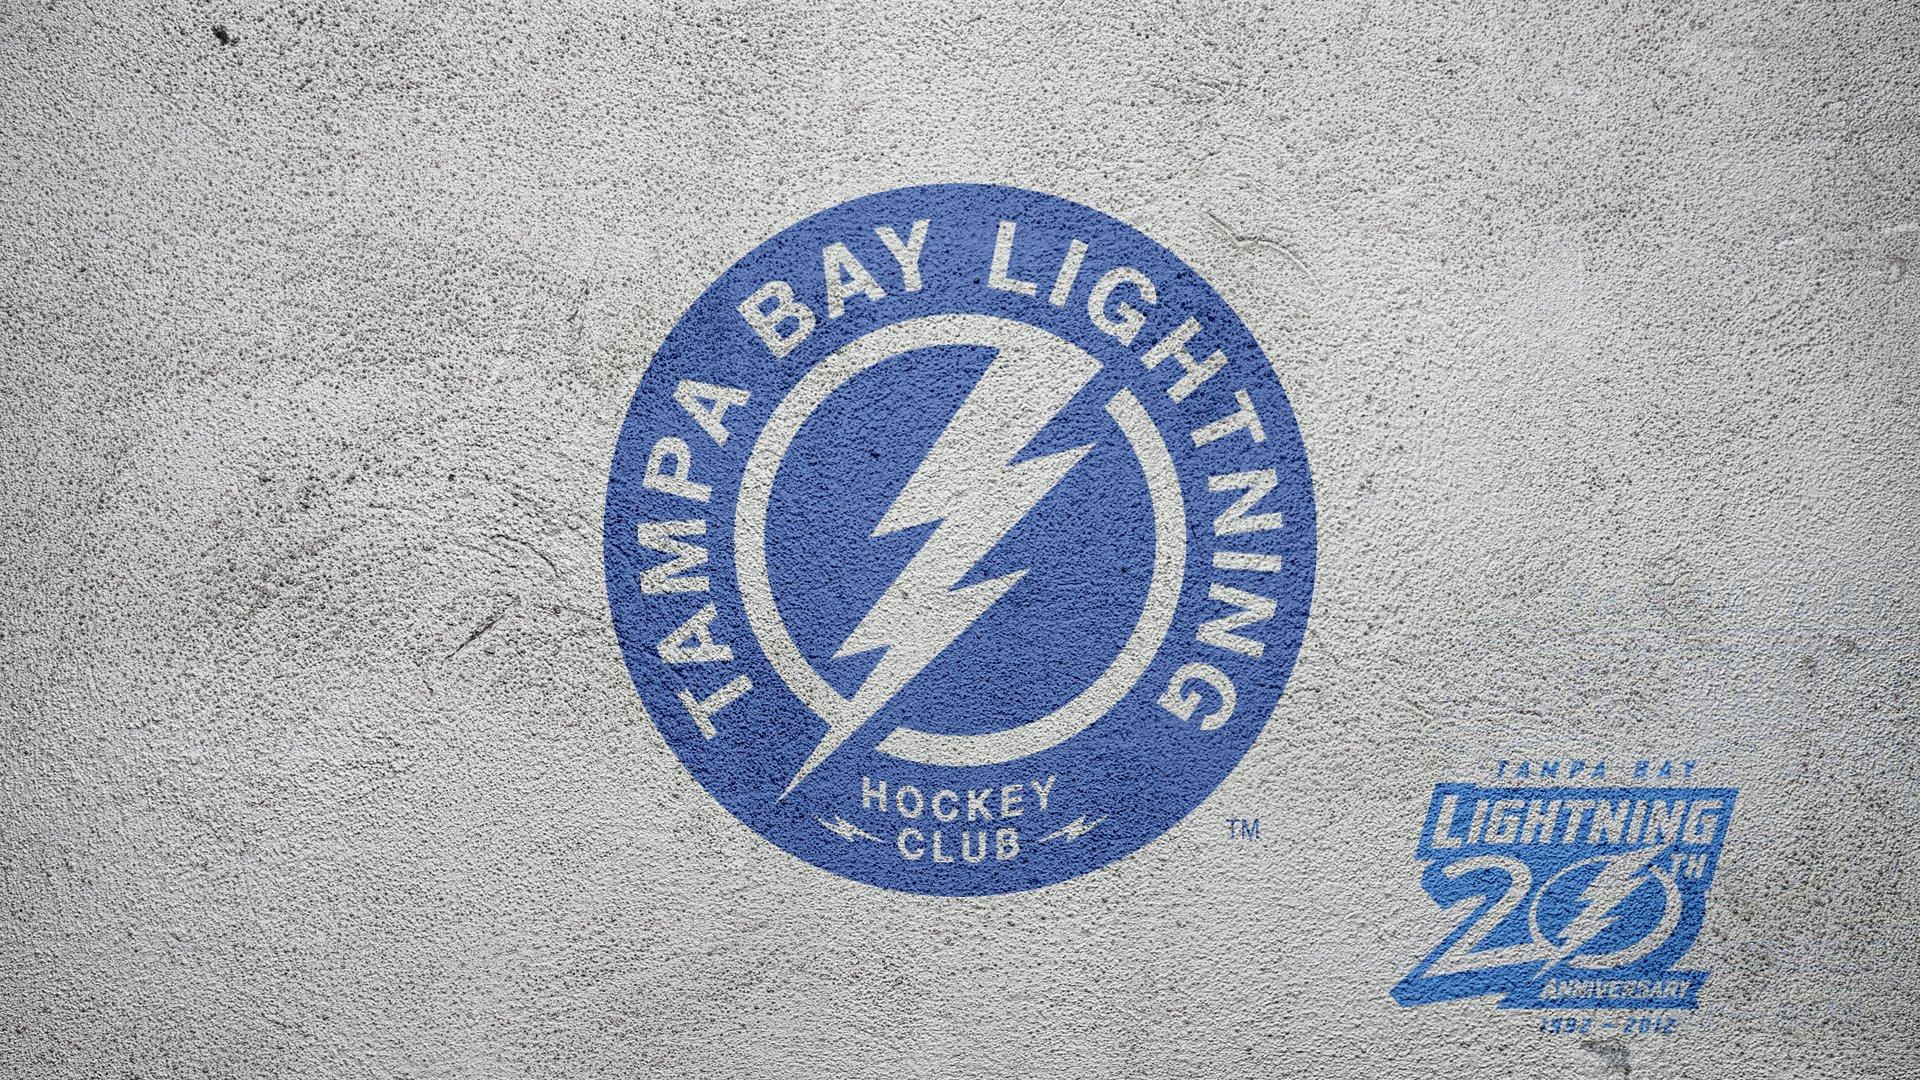 Tampa Bay Lightning NHL Wallpaper by Realyze 1920x1080